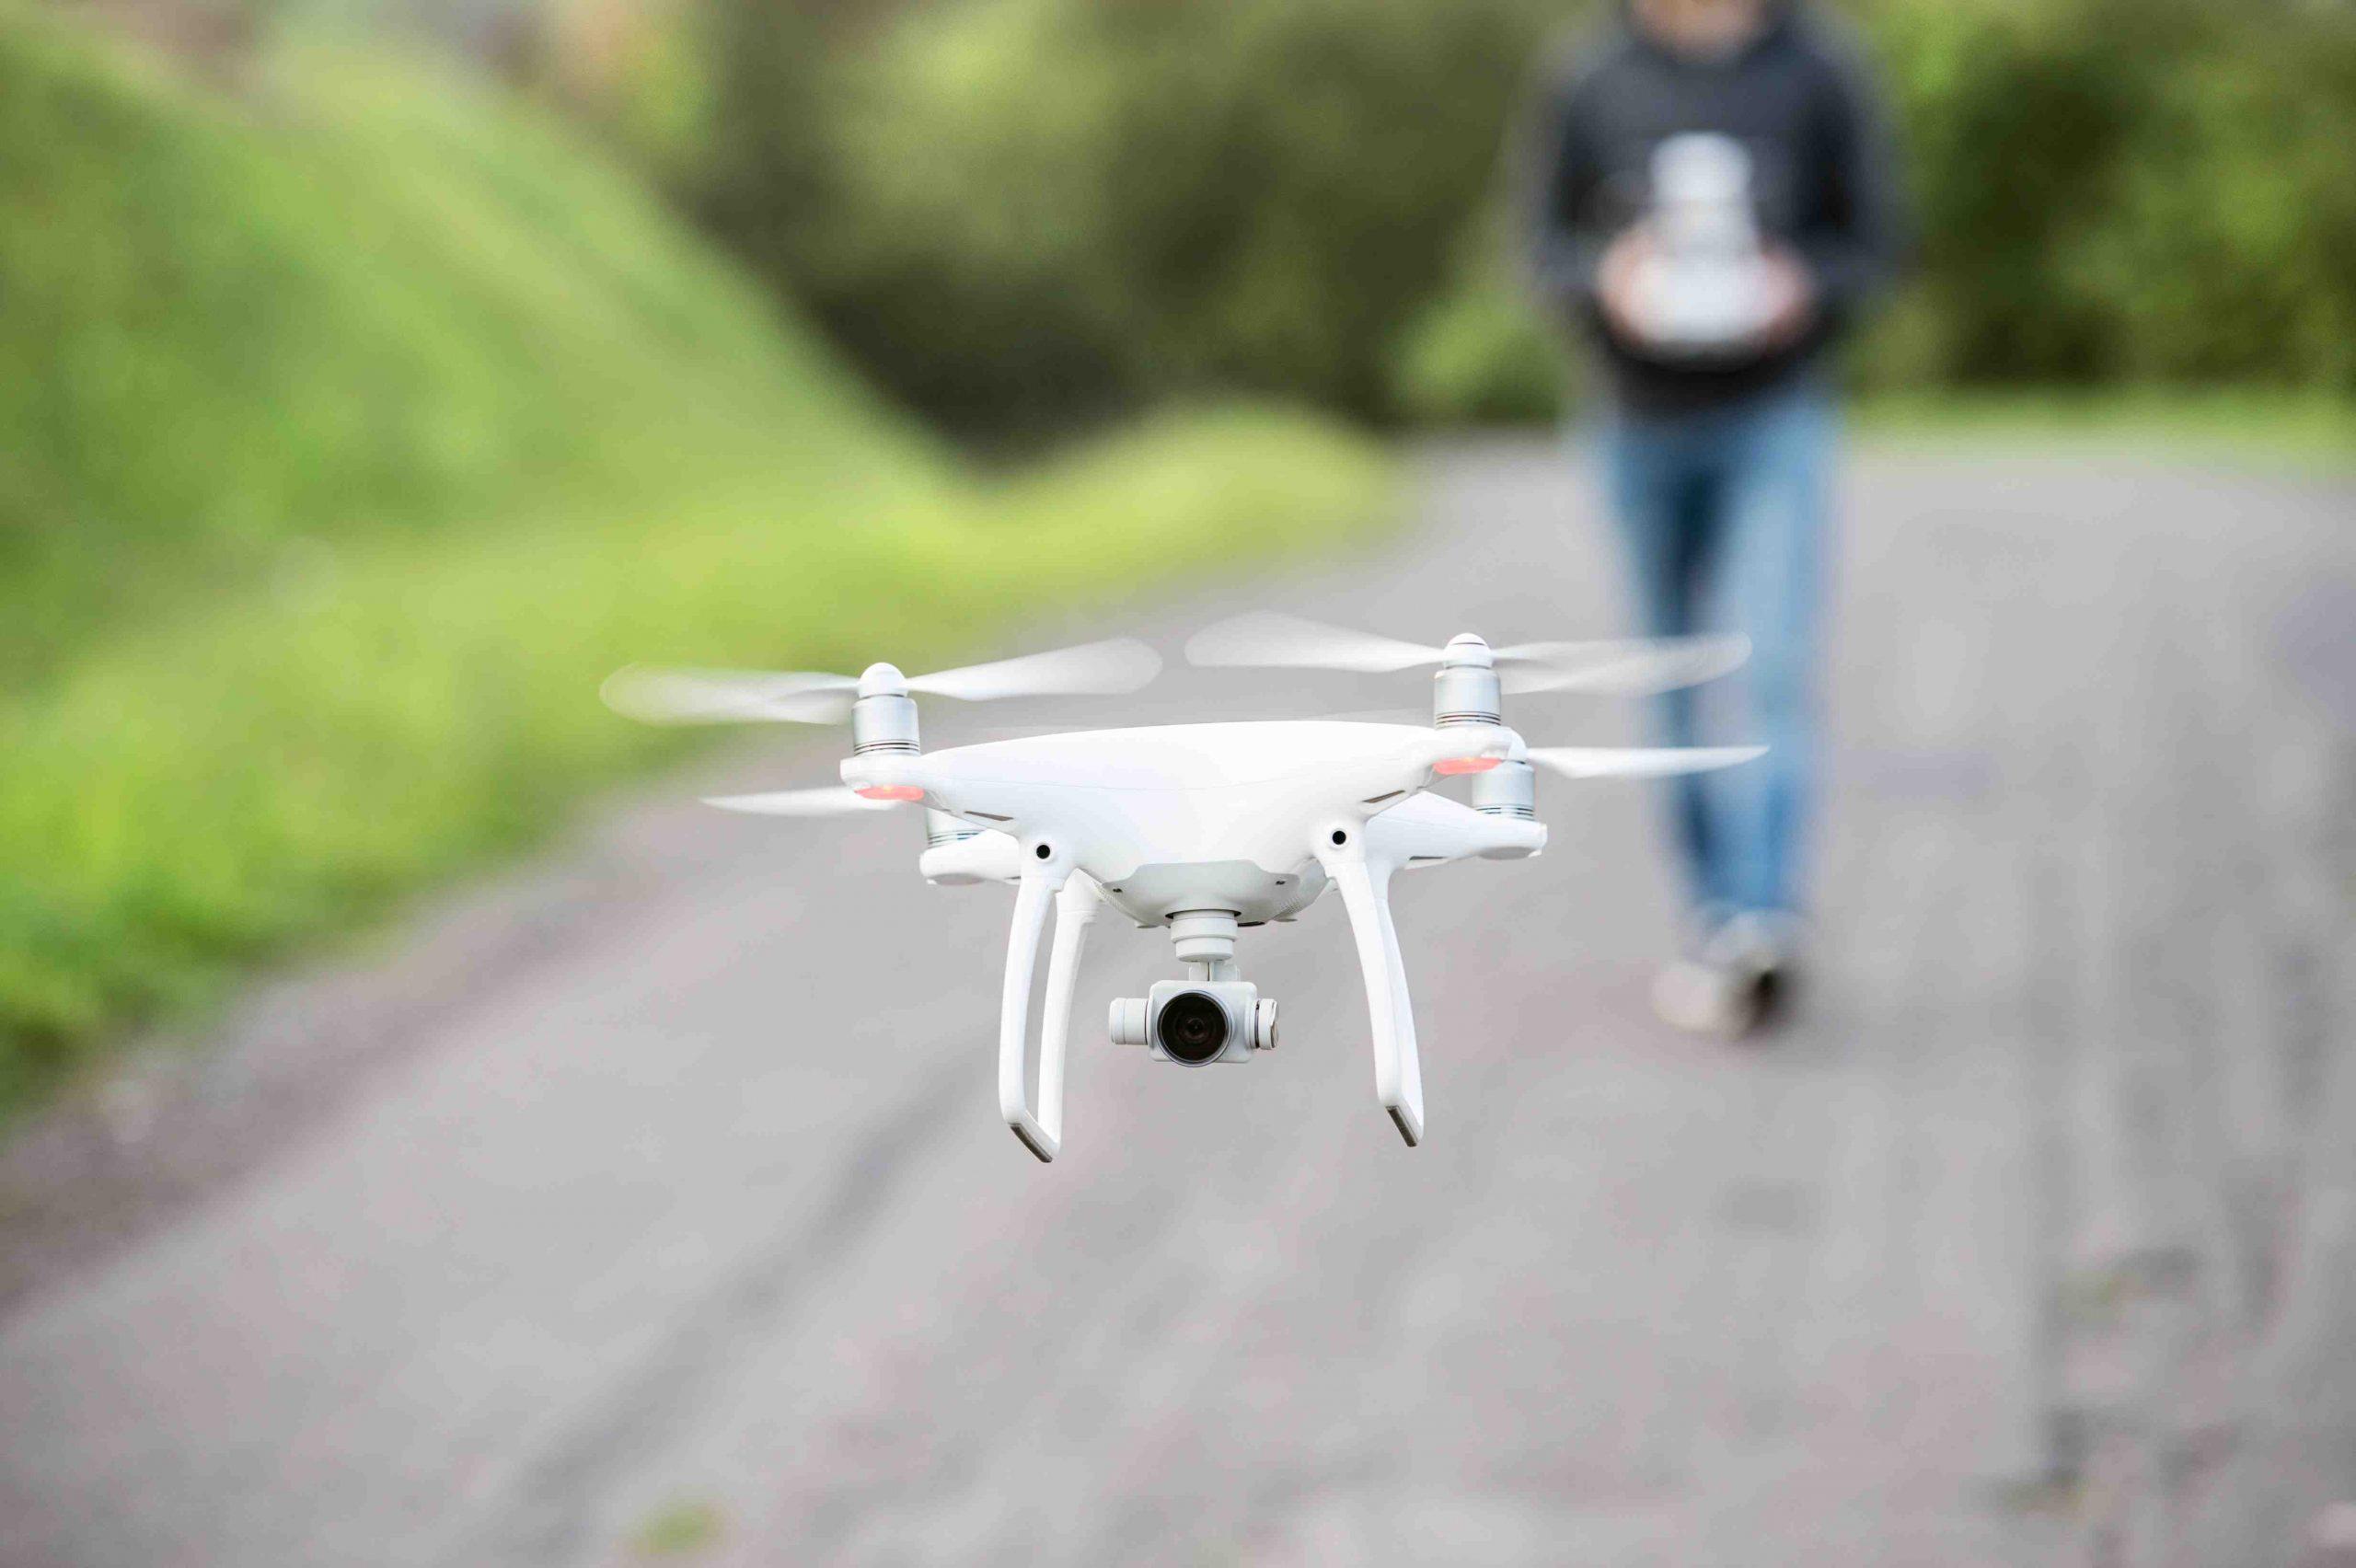 Aerial-Drone-video-huntington-beach-image